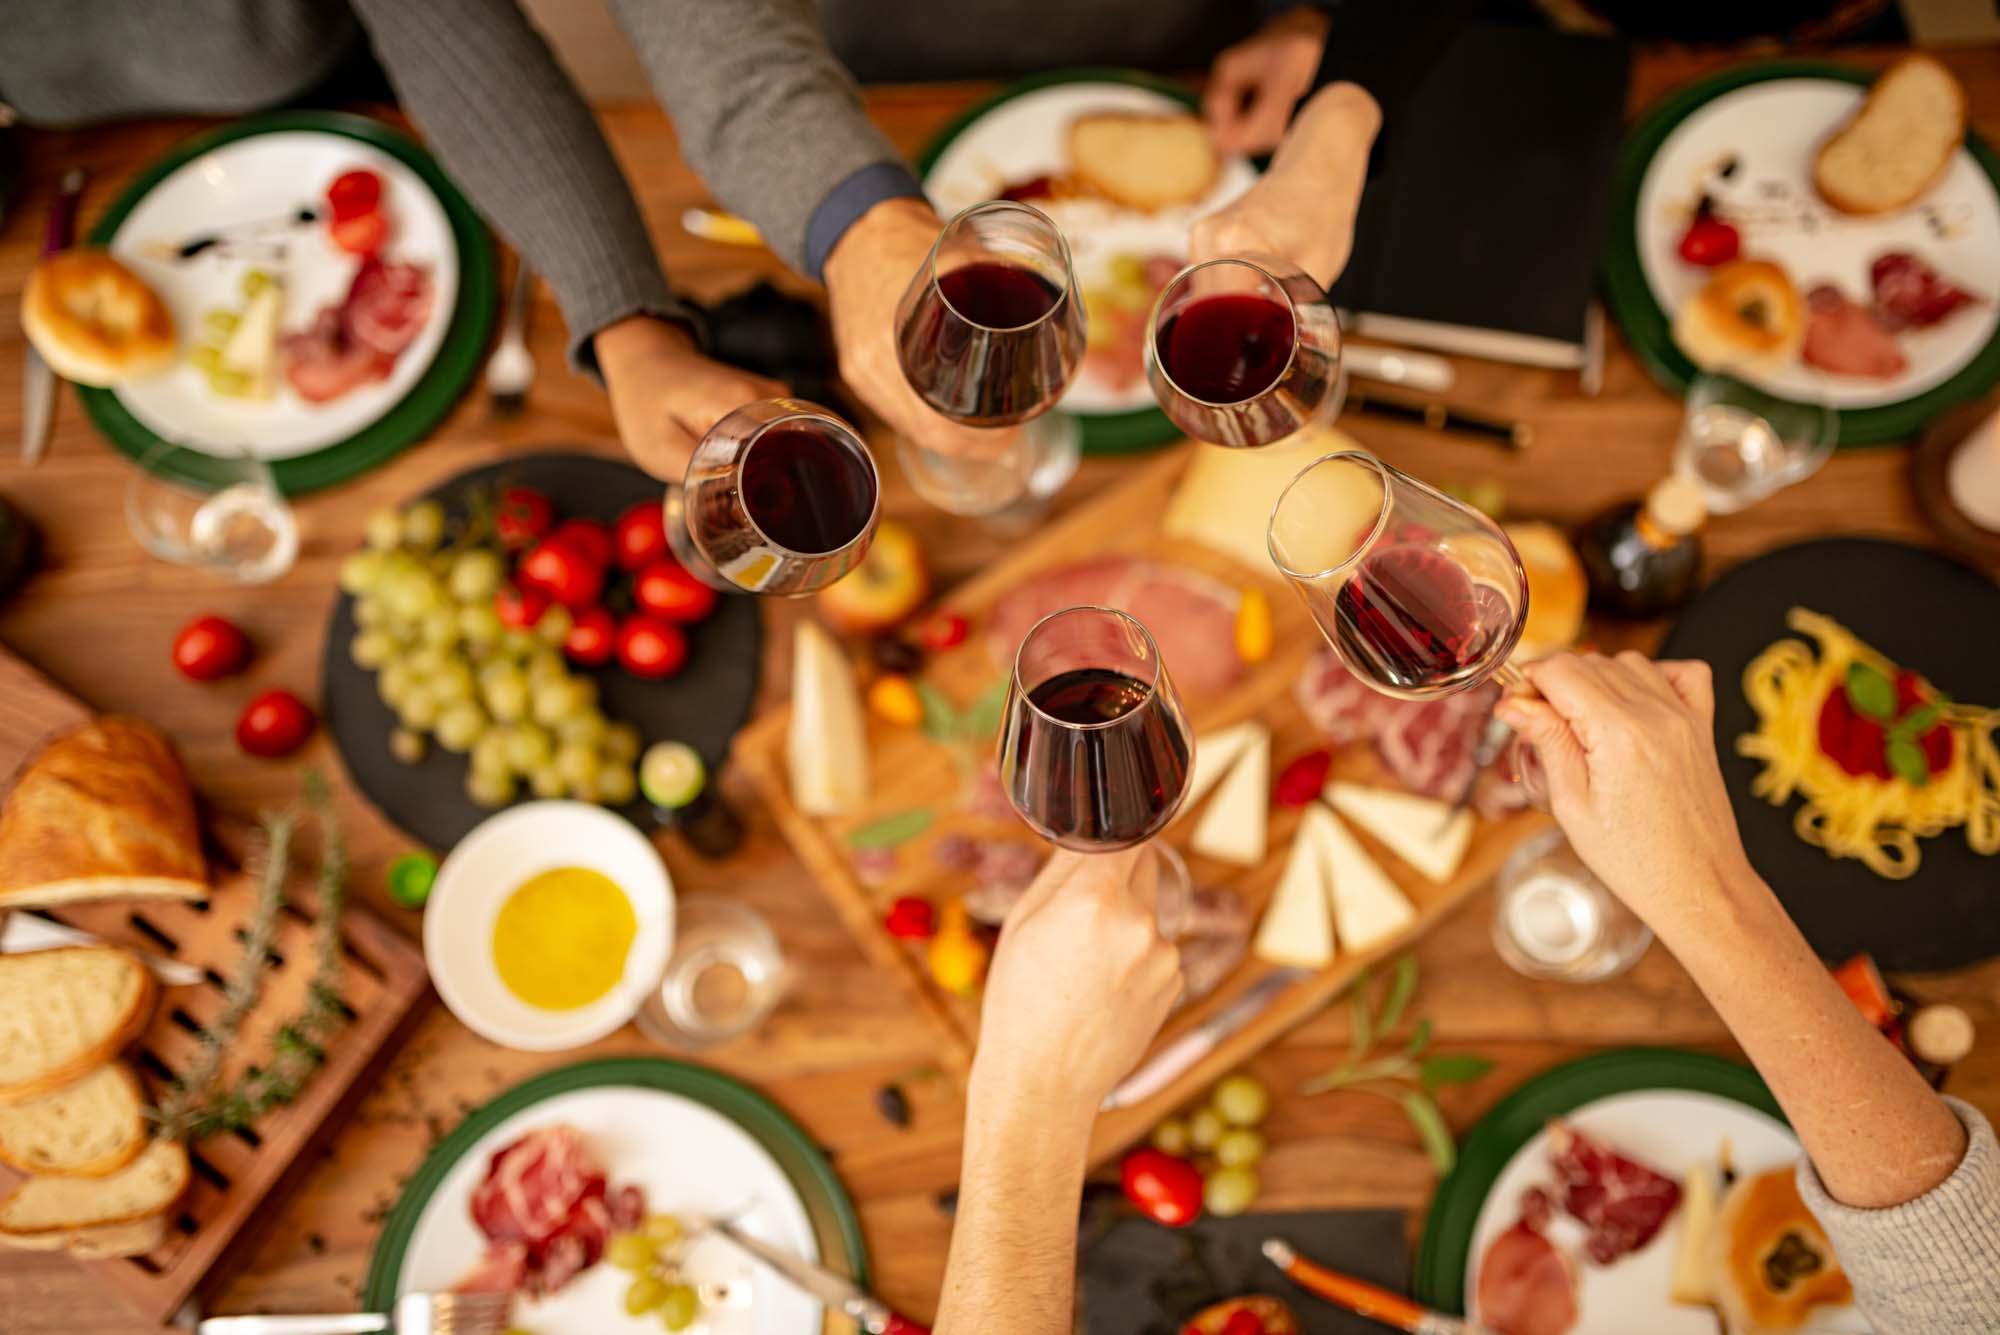 Cucina Amatoriale Formazione Manageriale a Padova